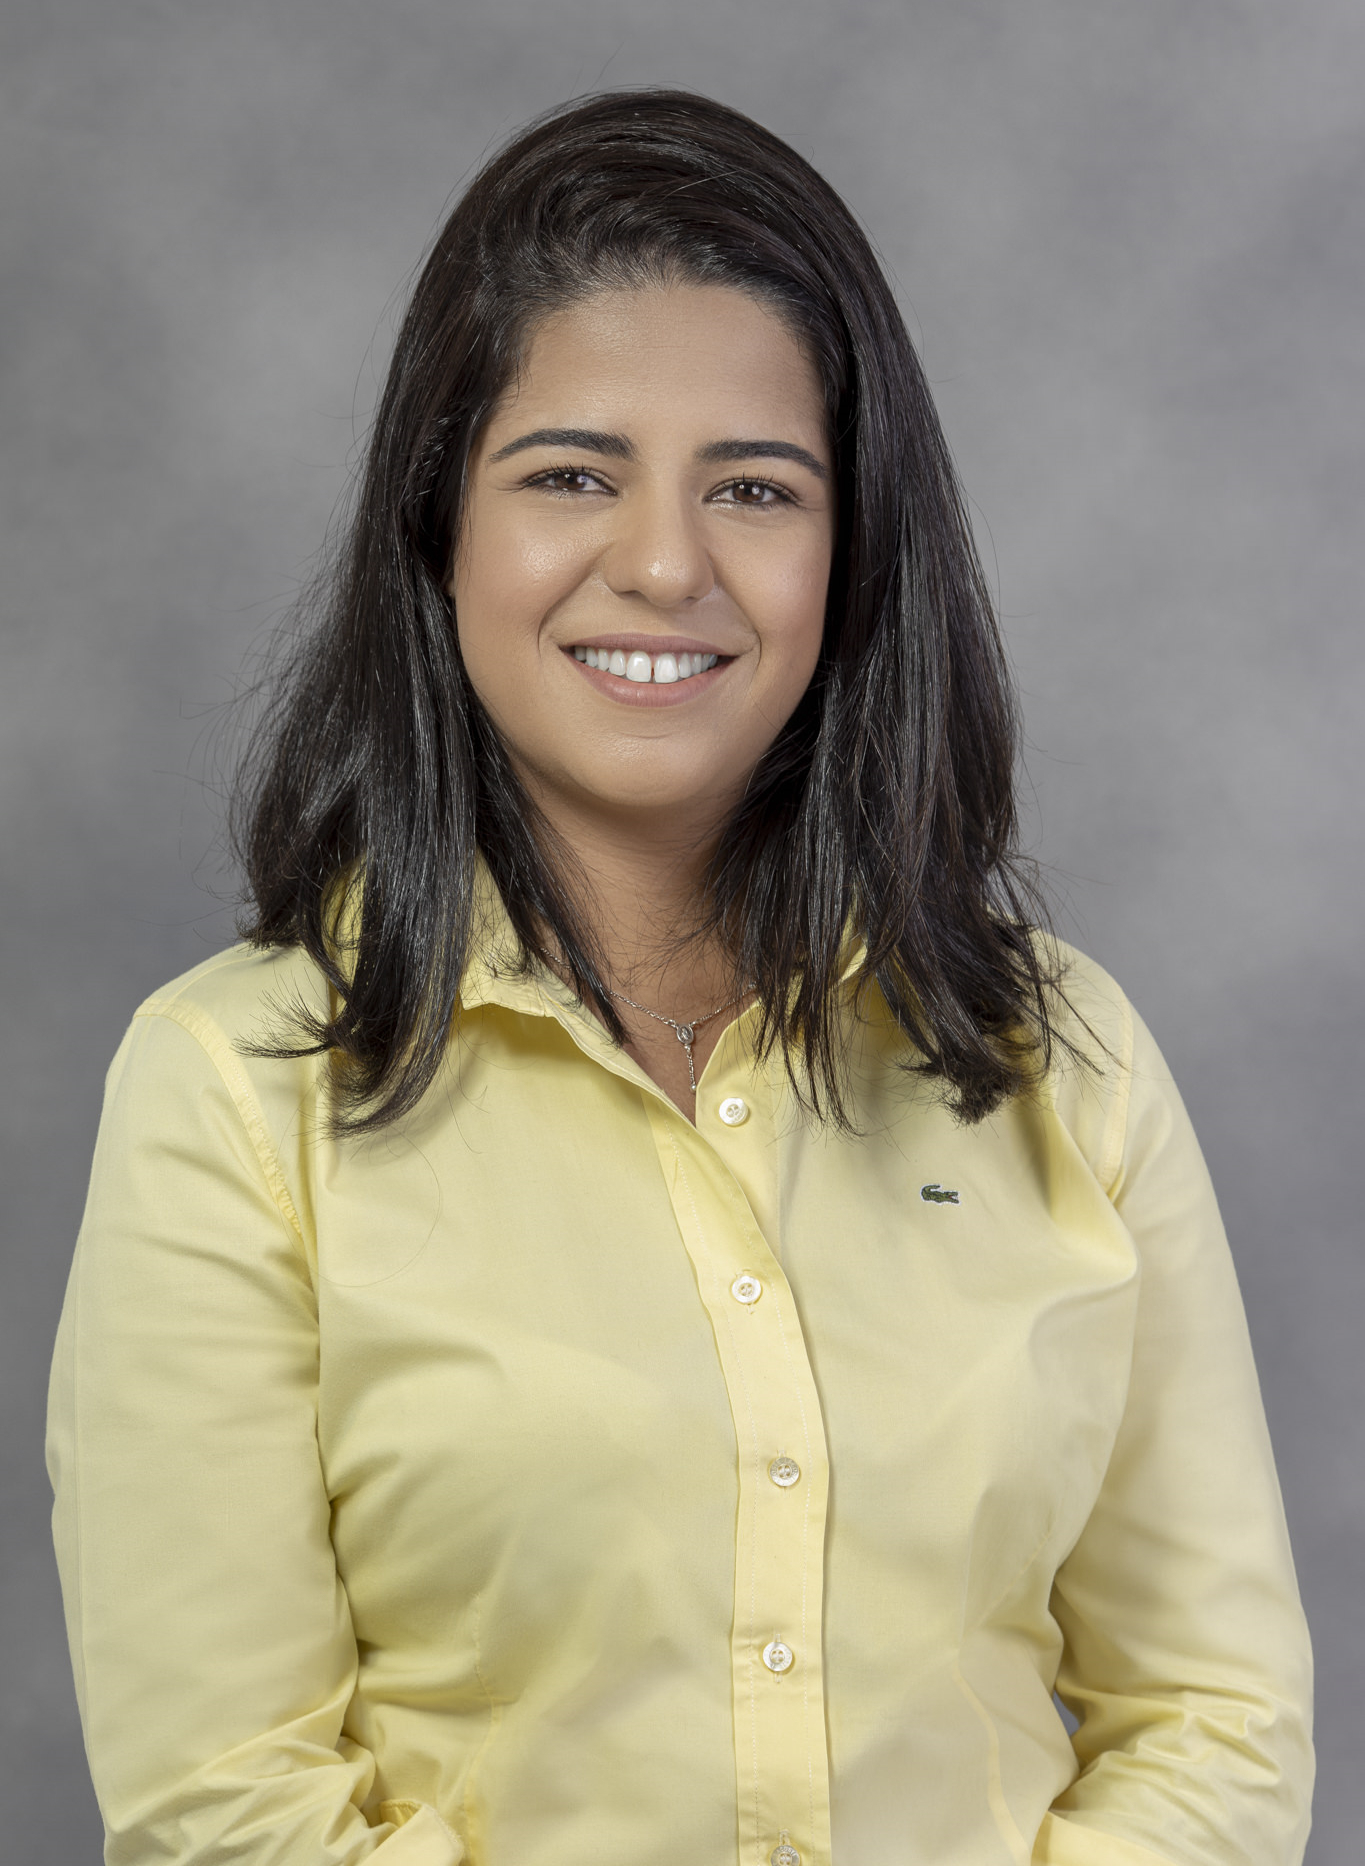 Sabrina Conde Coelho